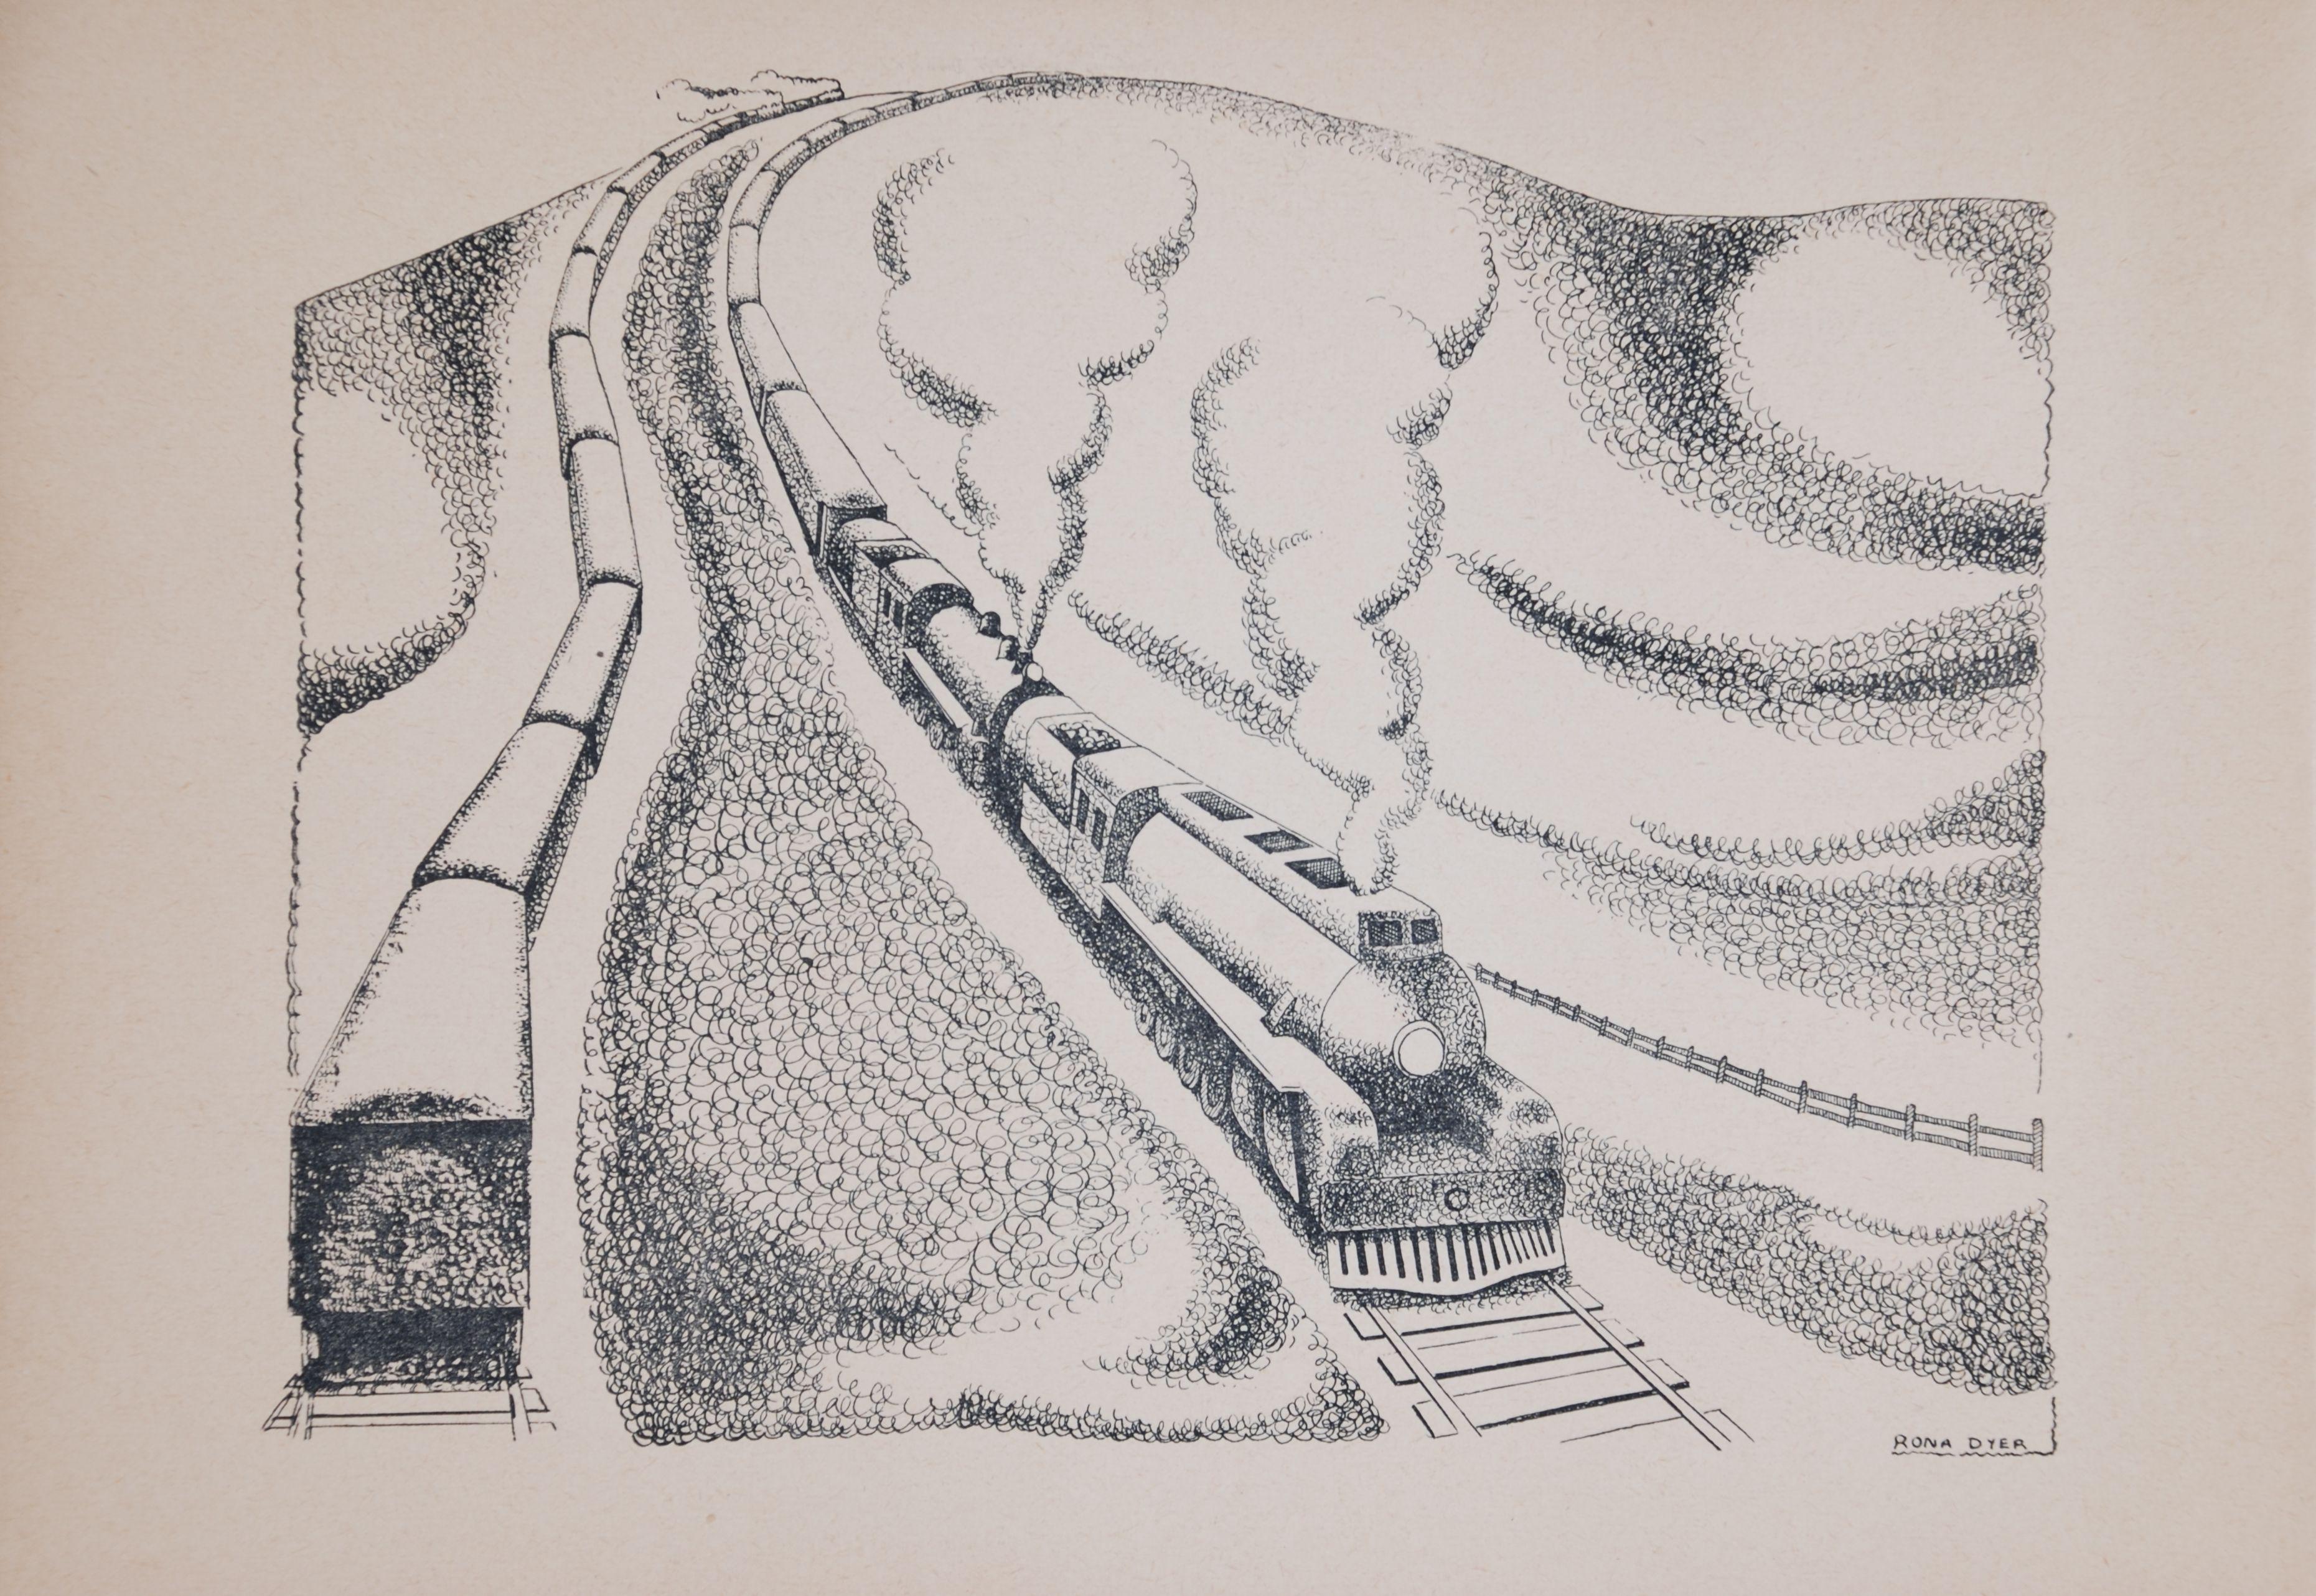 Aileen Findlay. The north bound express. Dunedin, N.Z.: Williamson Jeffery, c1944.